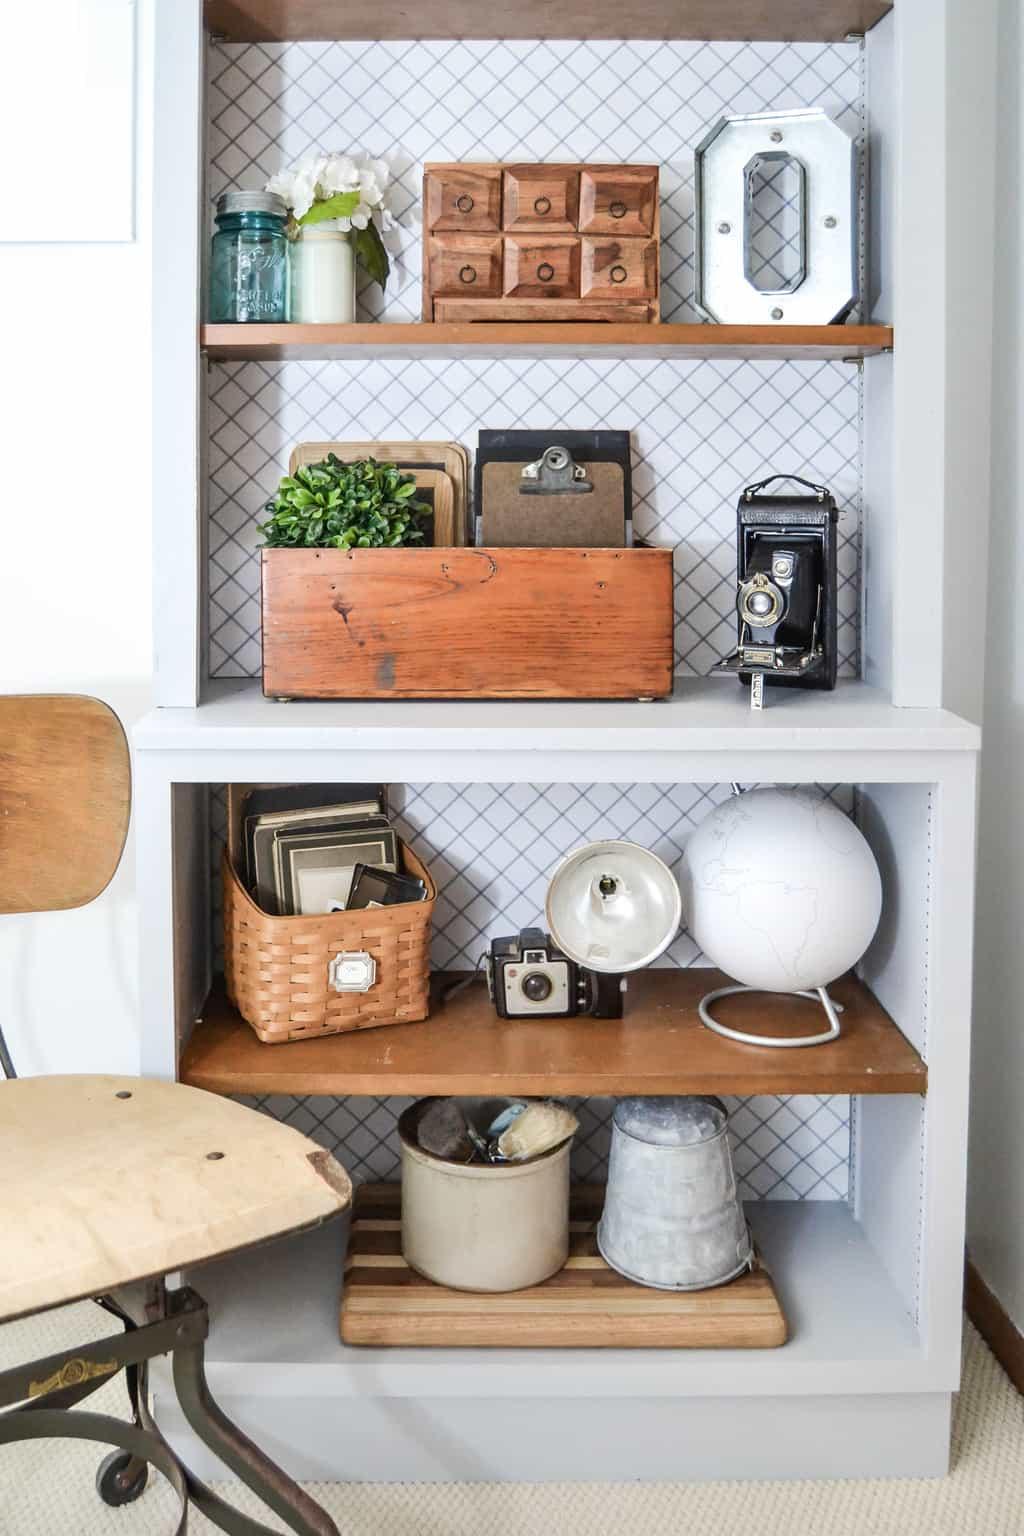 Pin This · Bookshelf Makeover   Looking To Make Over A Plain Bookshelf To  Make It Look More Custom